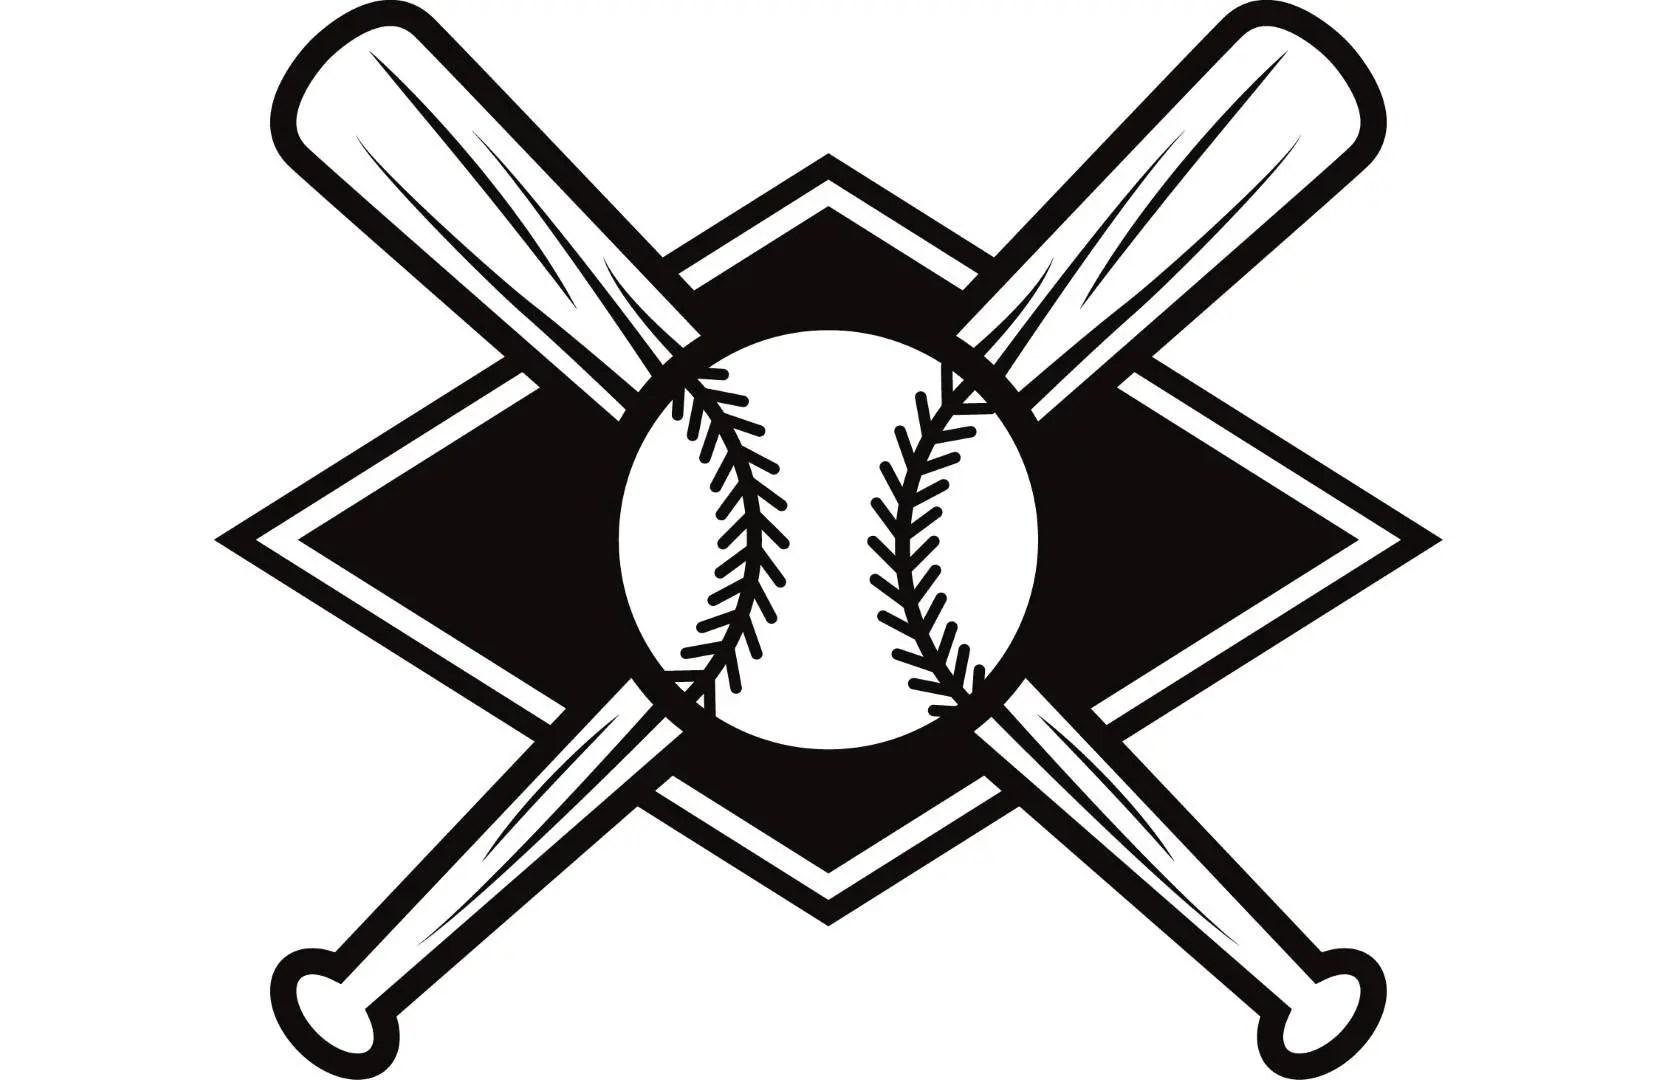 Baseball Logo 7 Bats Crossed Ball Diamond League Equipment